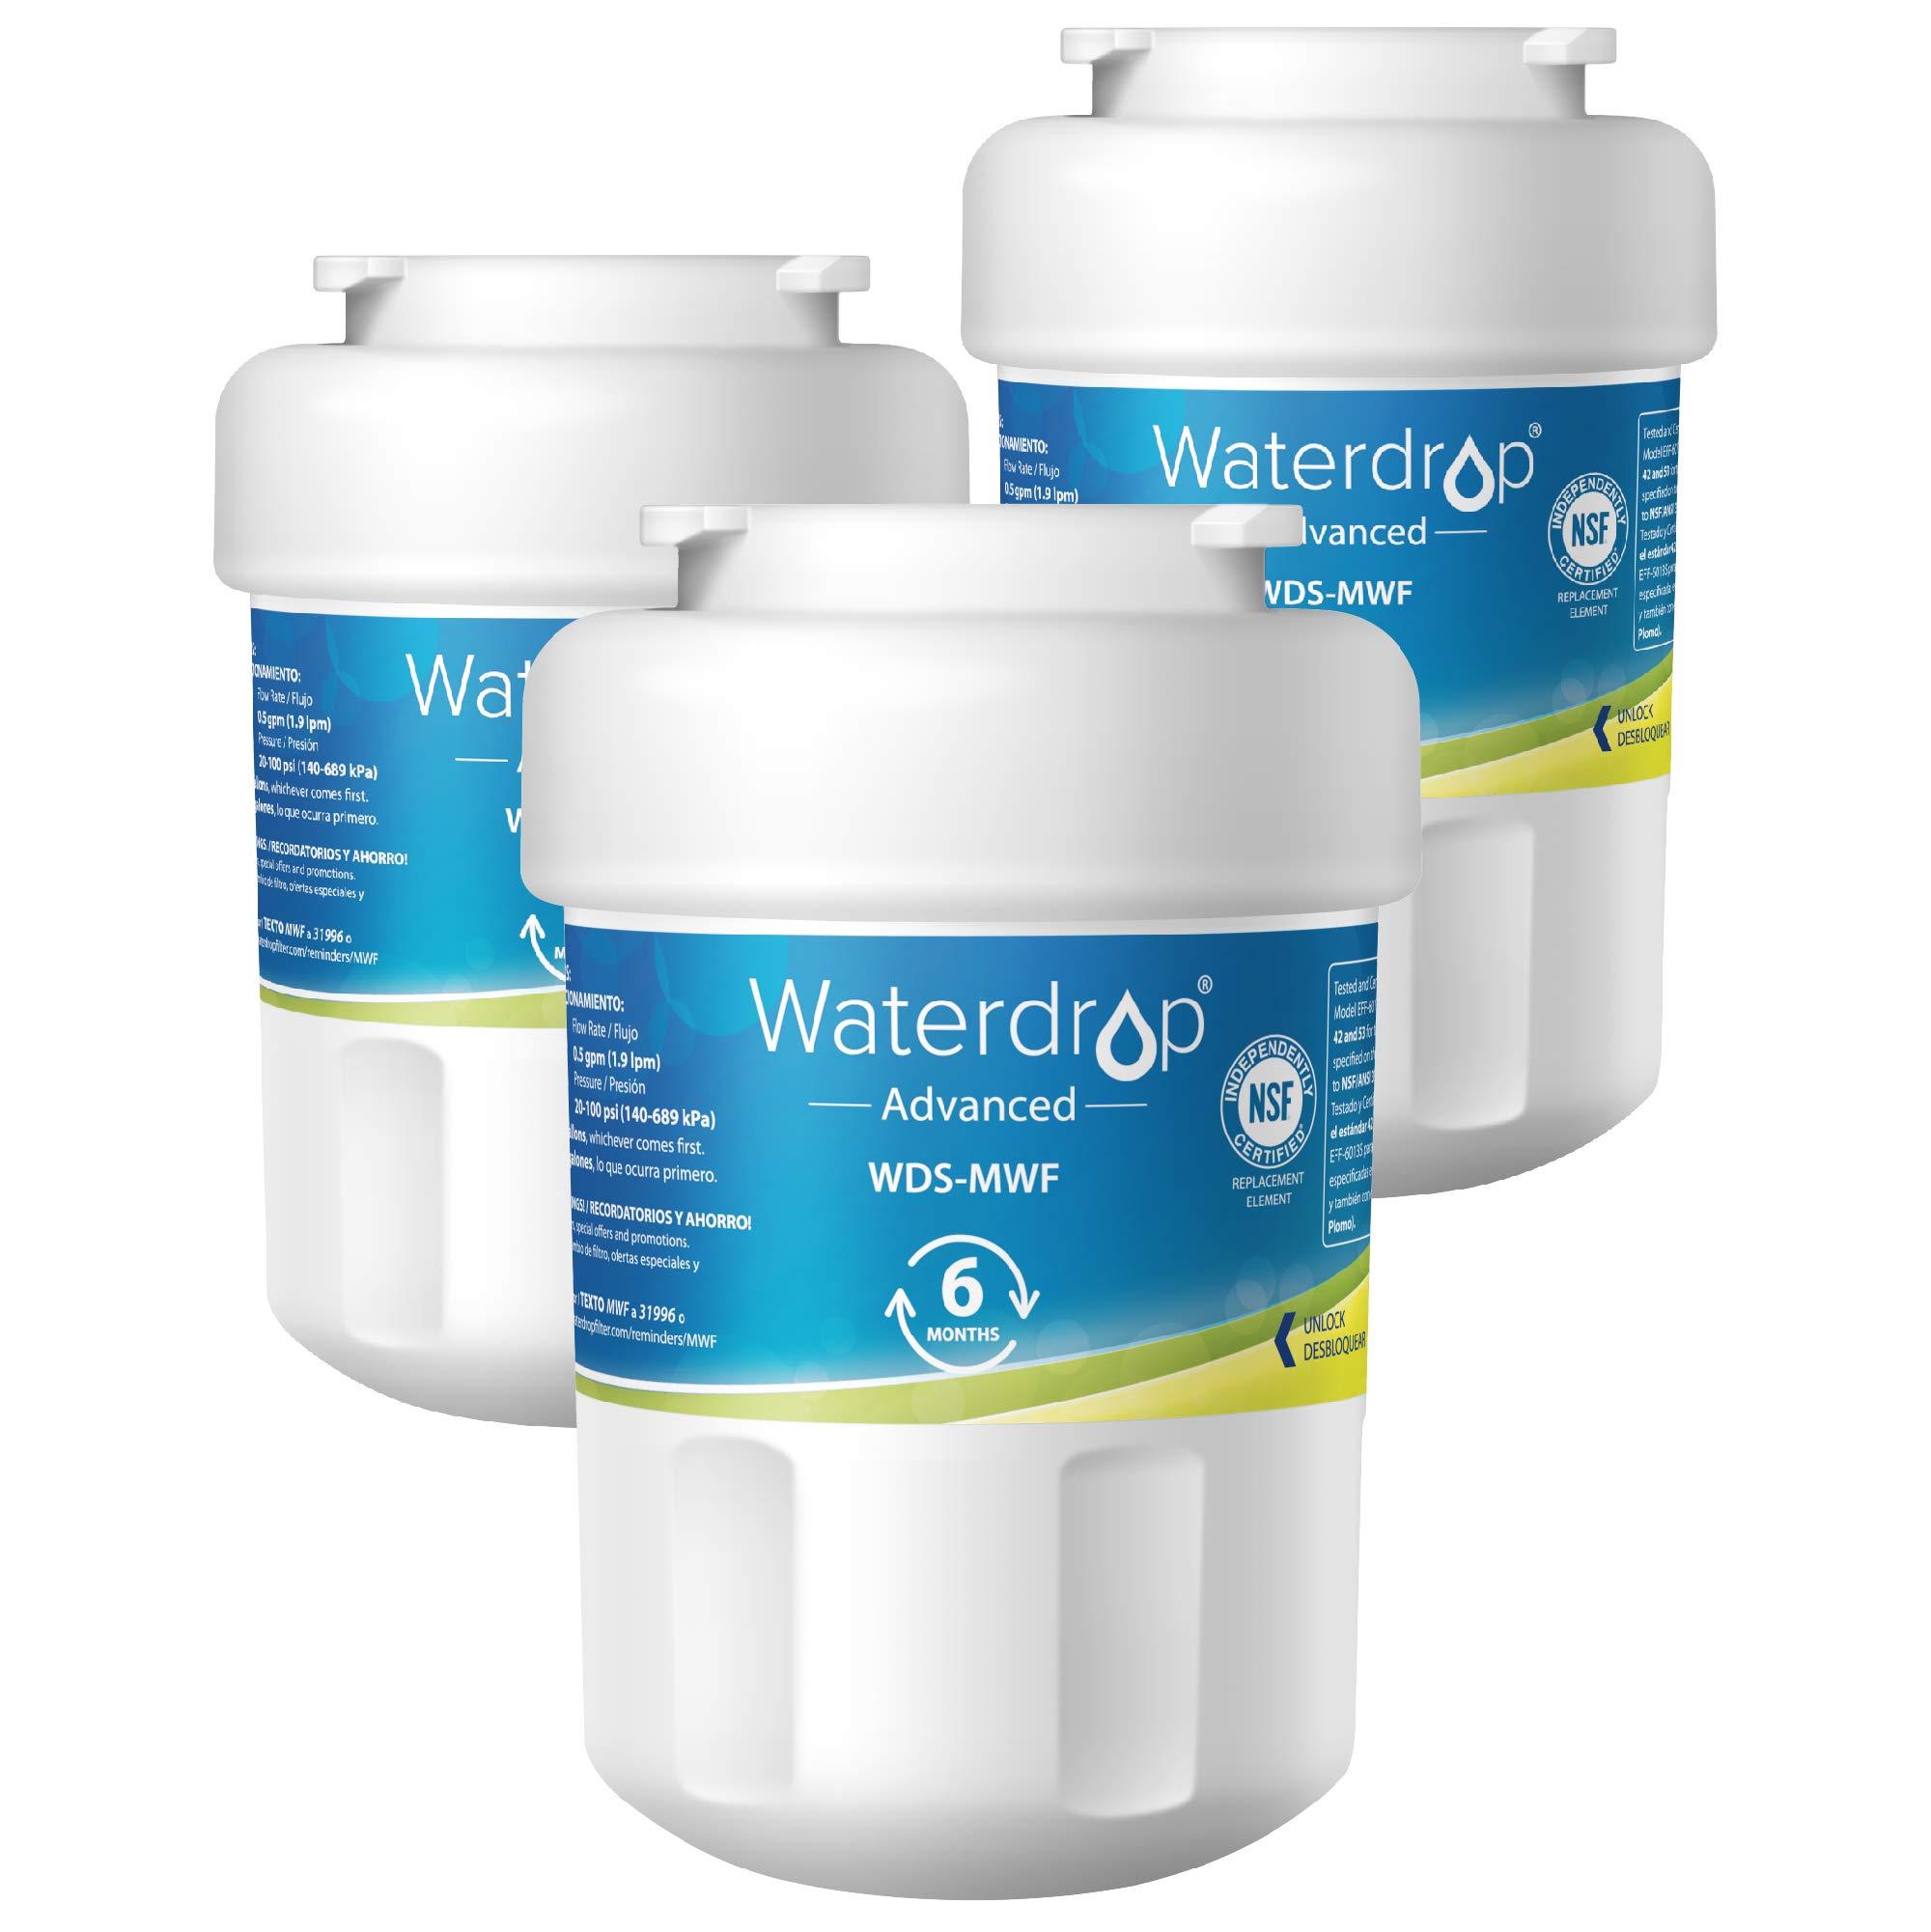 Waterdrop Replacement Refrigerator Compatible SmartWater